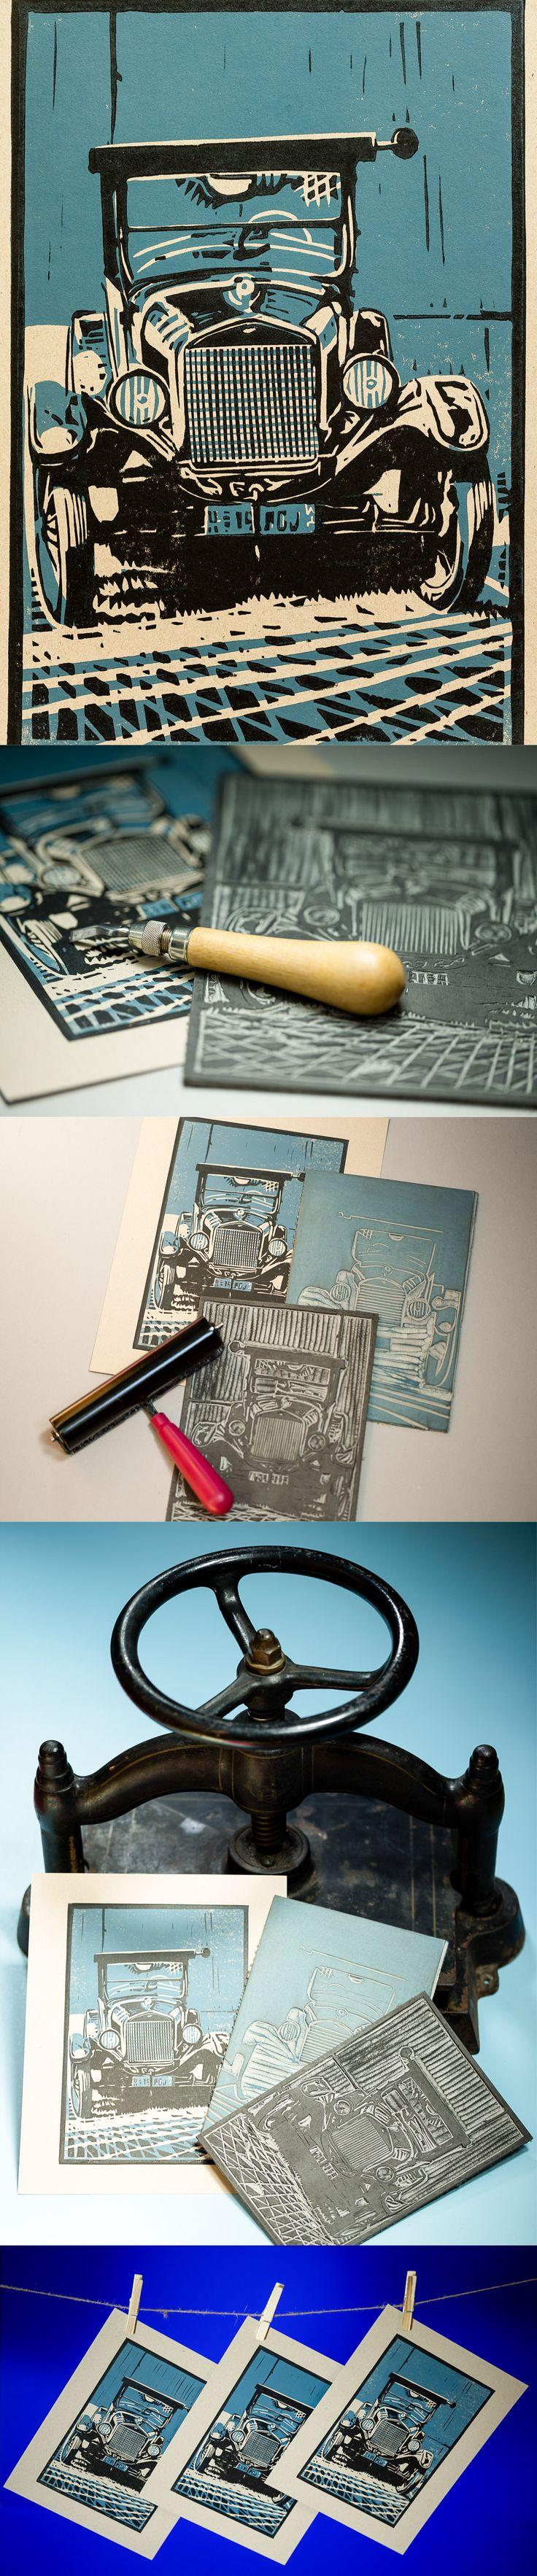 best printmaking images on pinterest printmaking art print